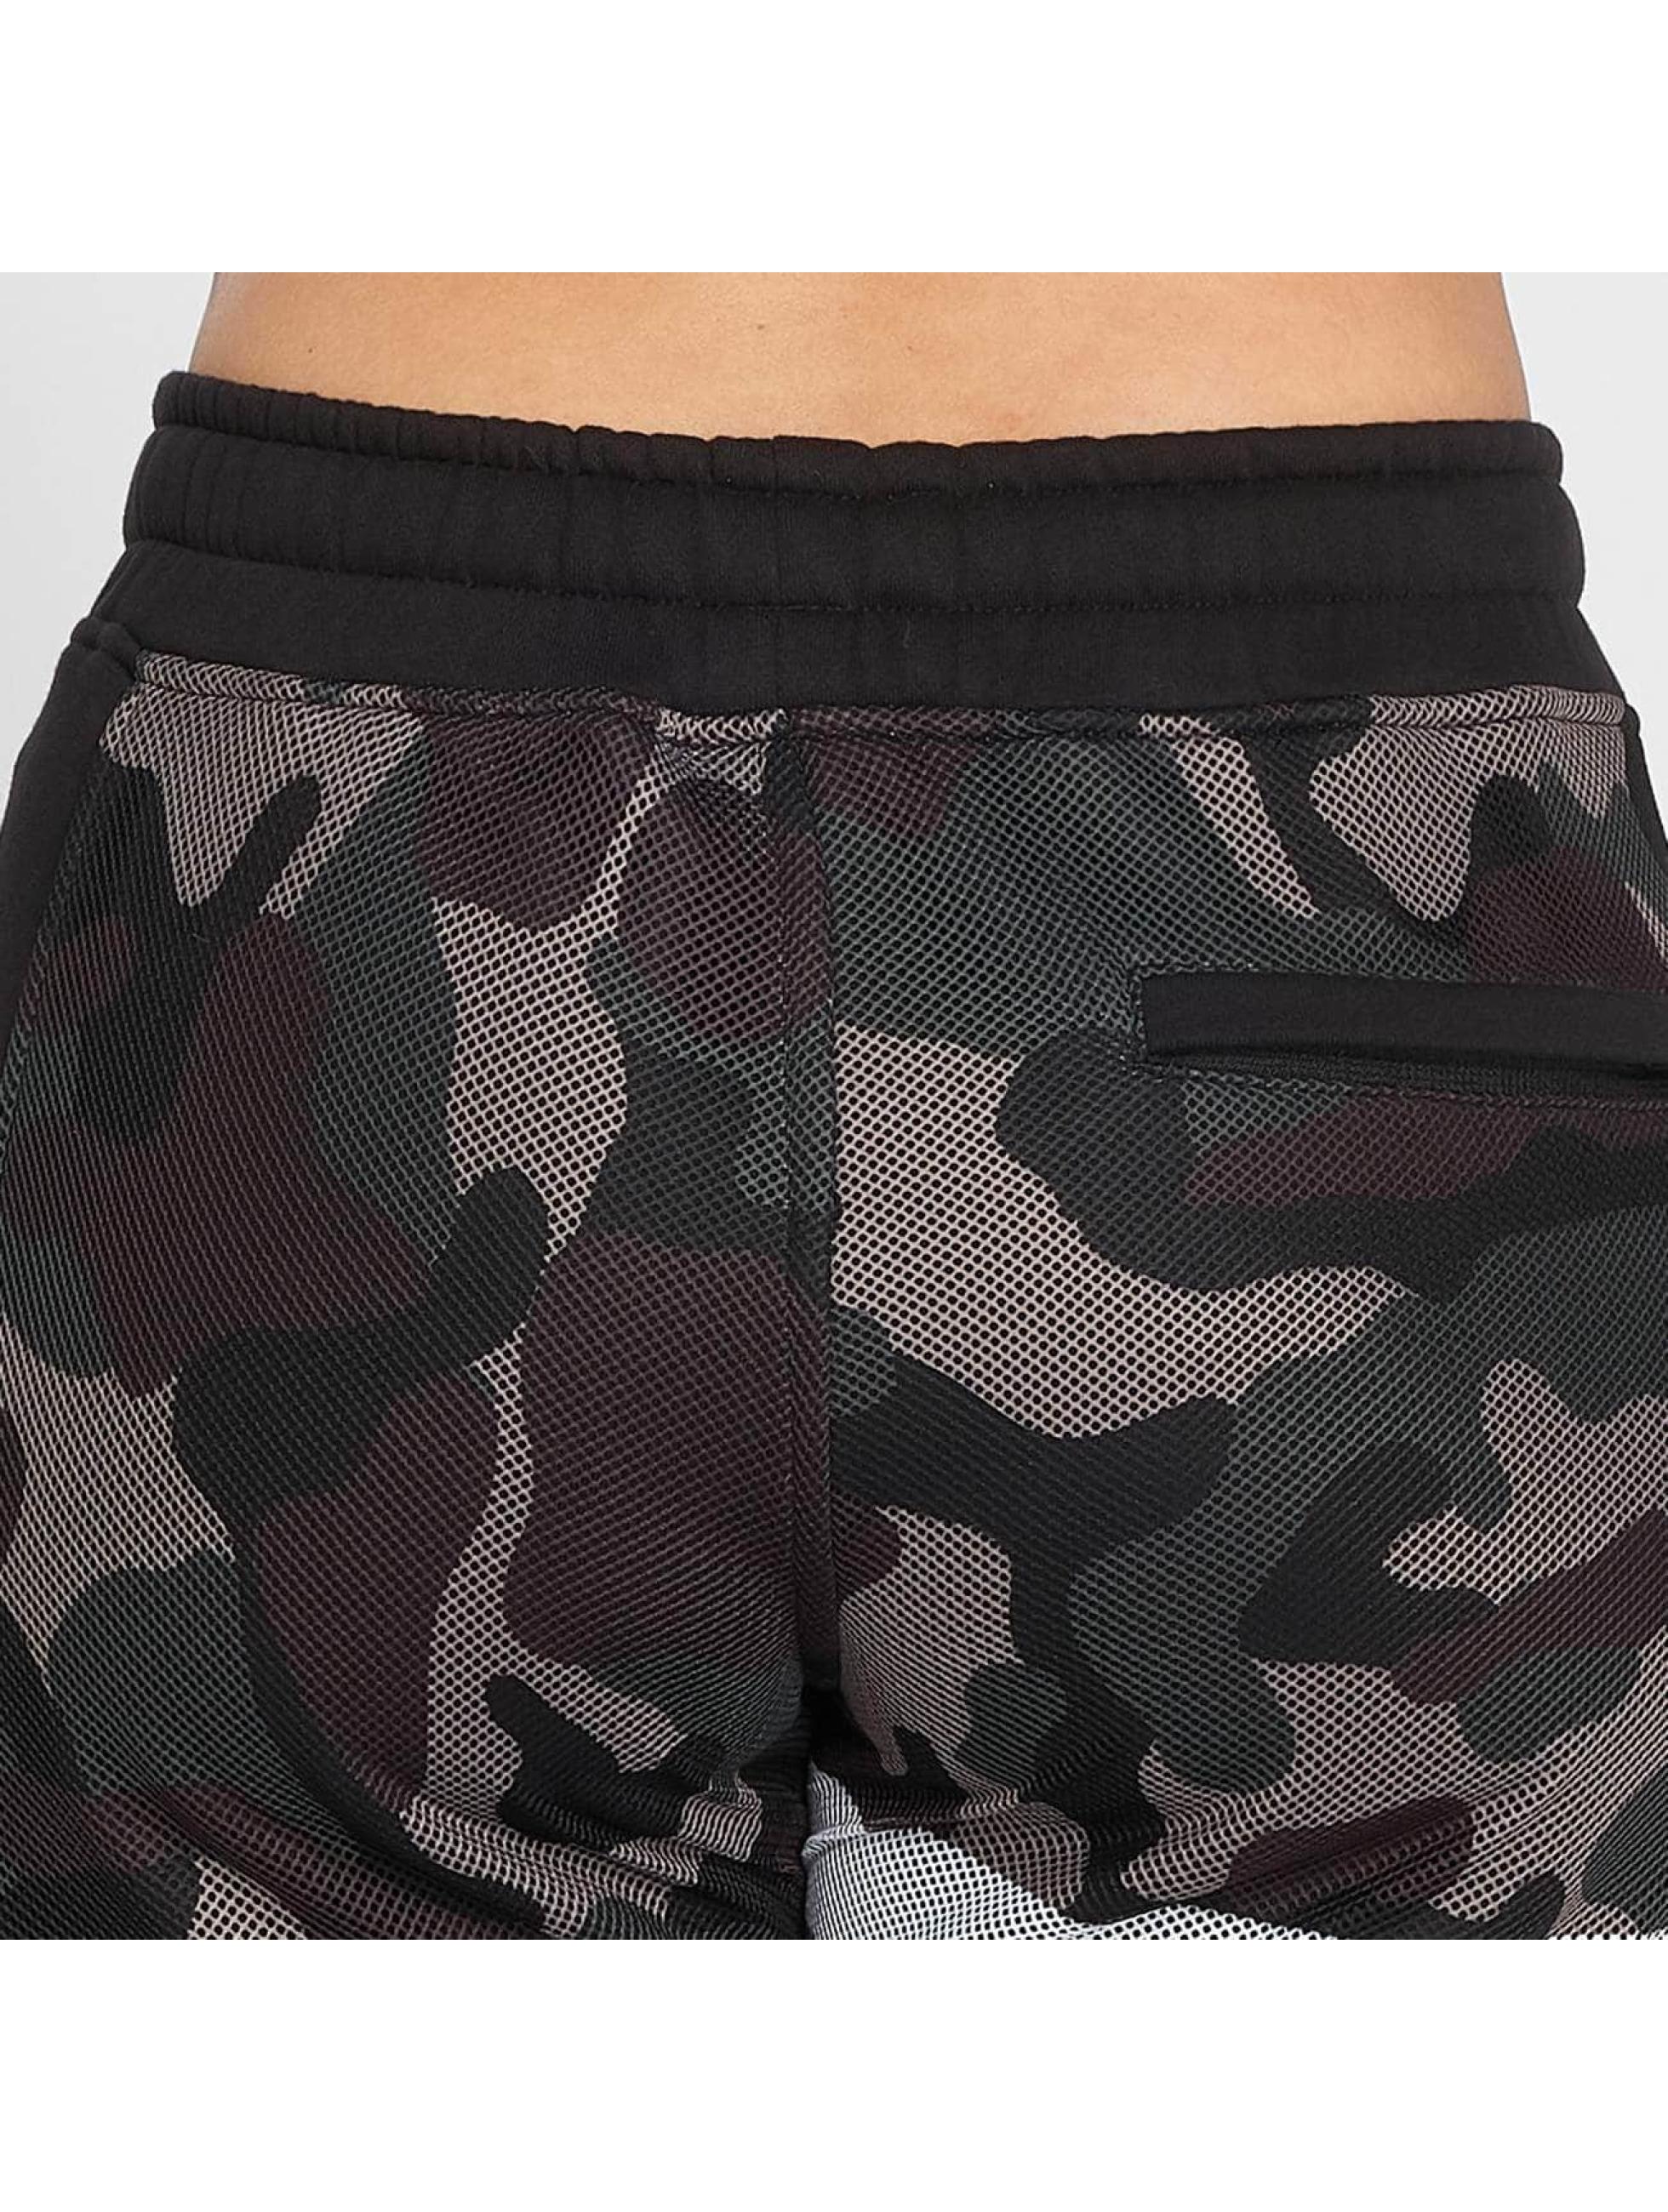 Babystaff Jogging Asira camouflage